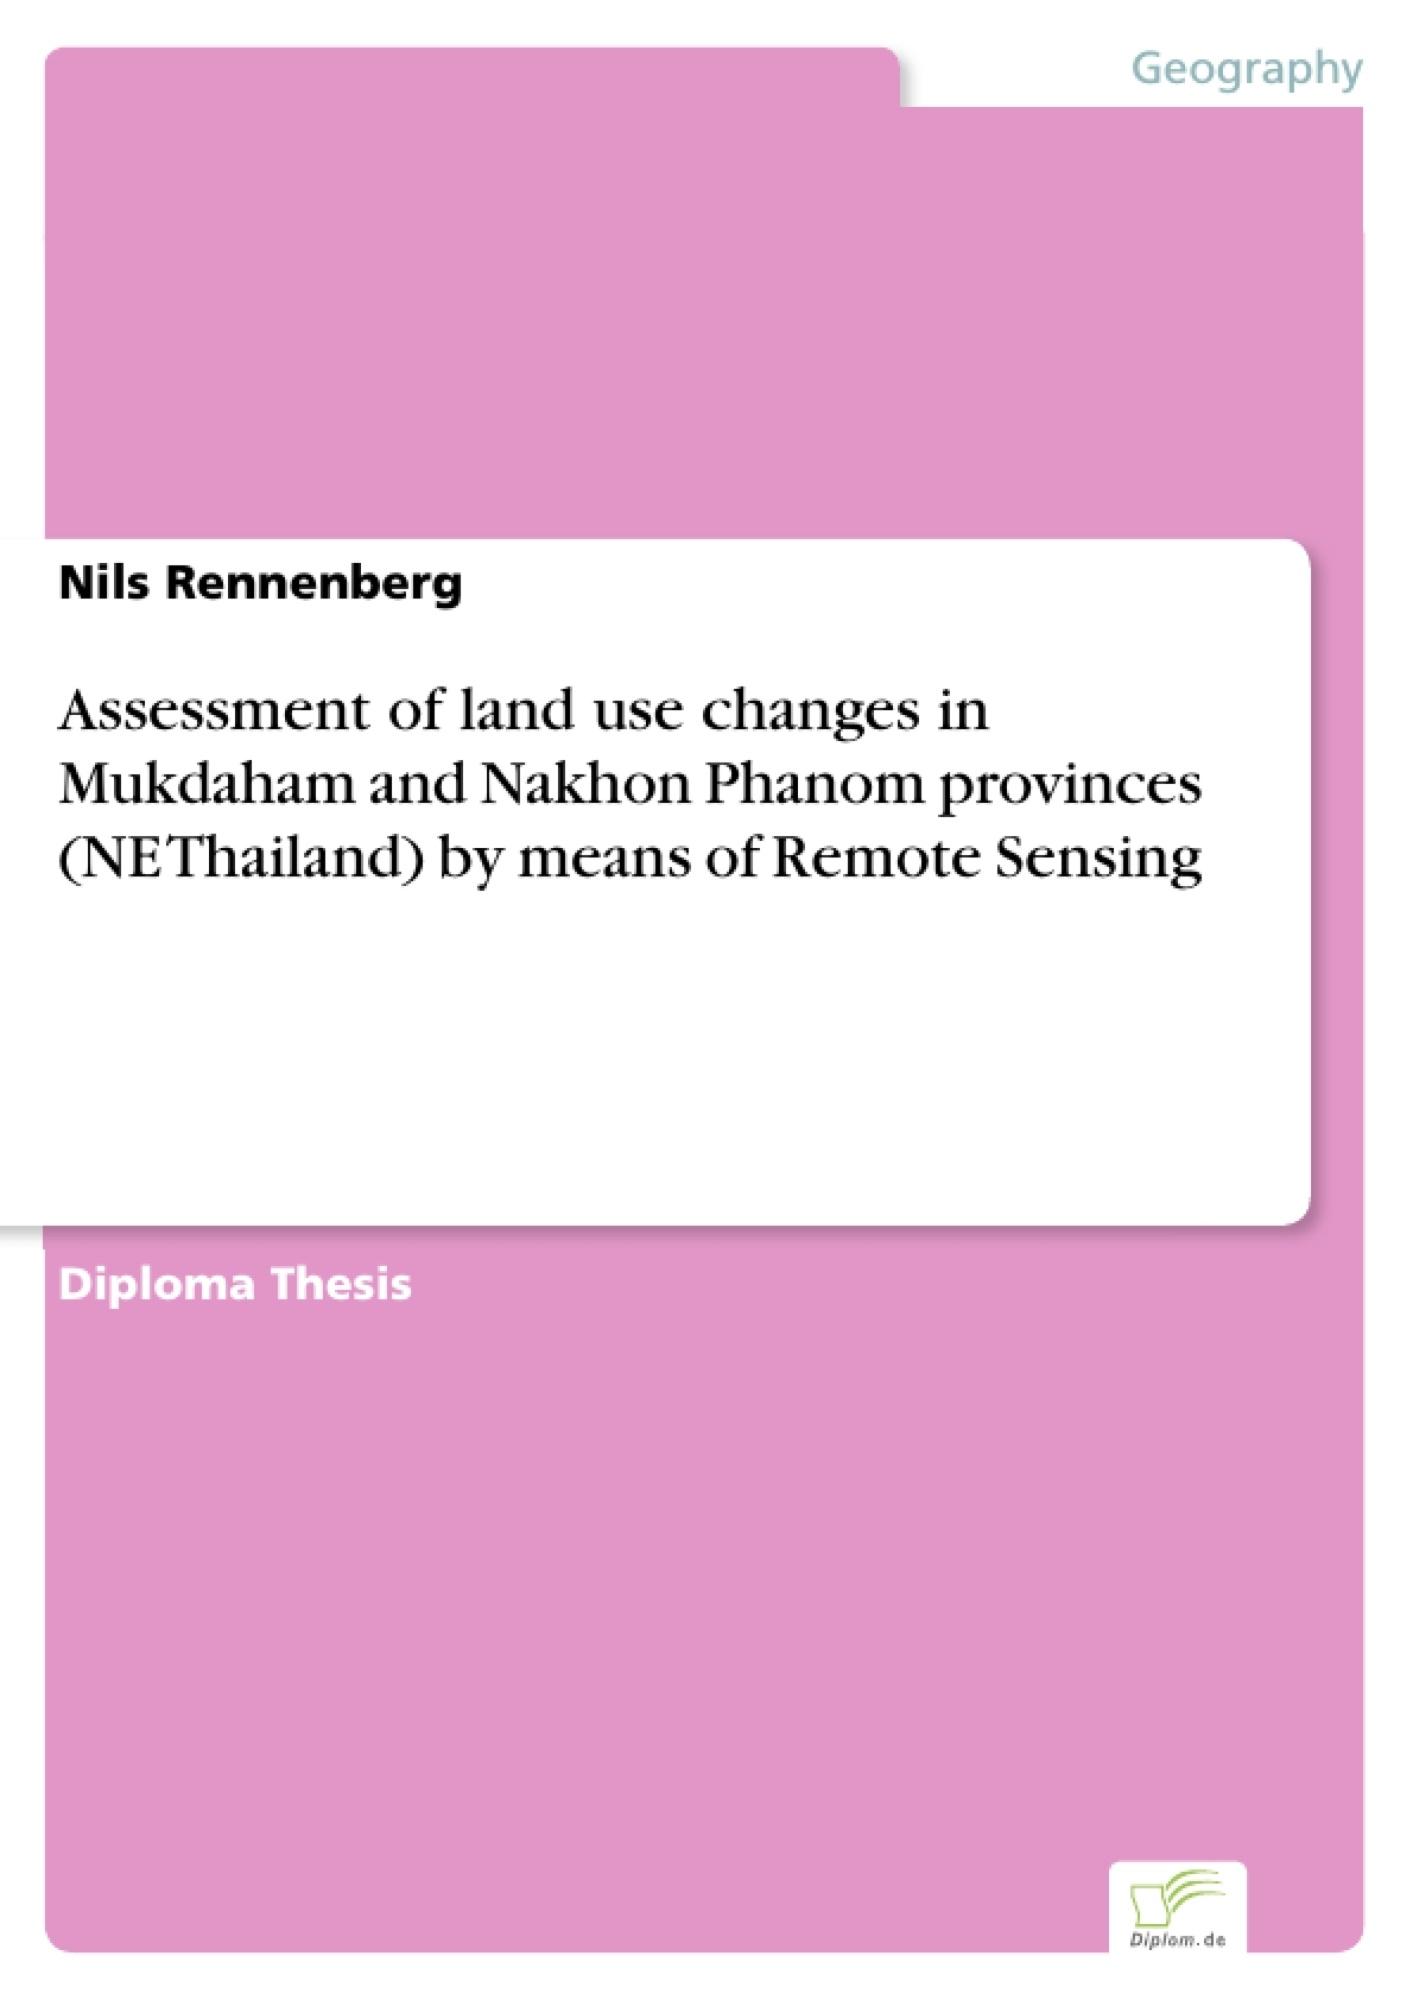 24bd282c Assessment of land use changes in Mukdaham and Nakhon Phanom ...